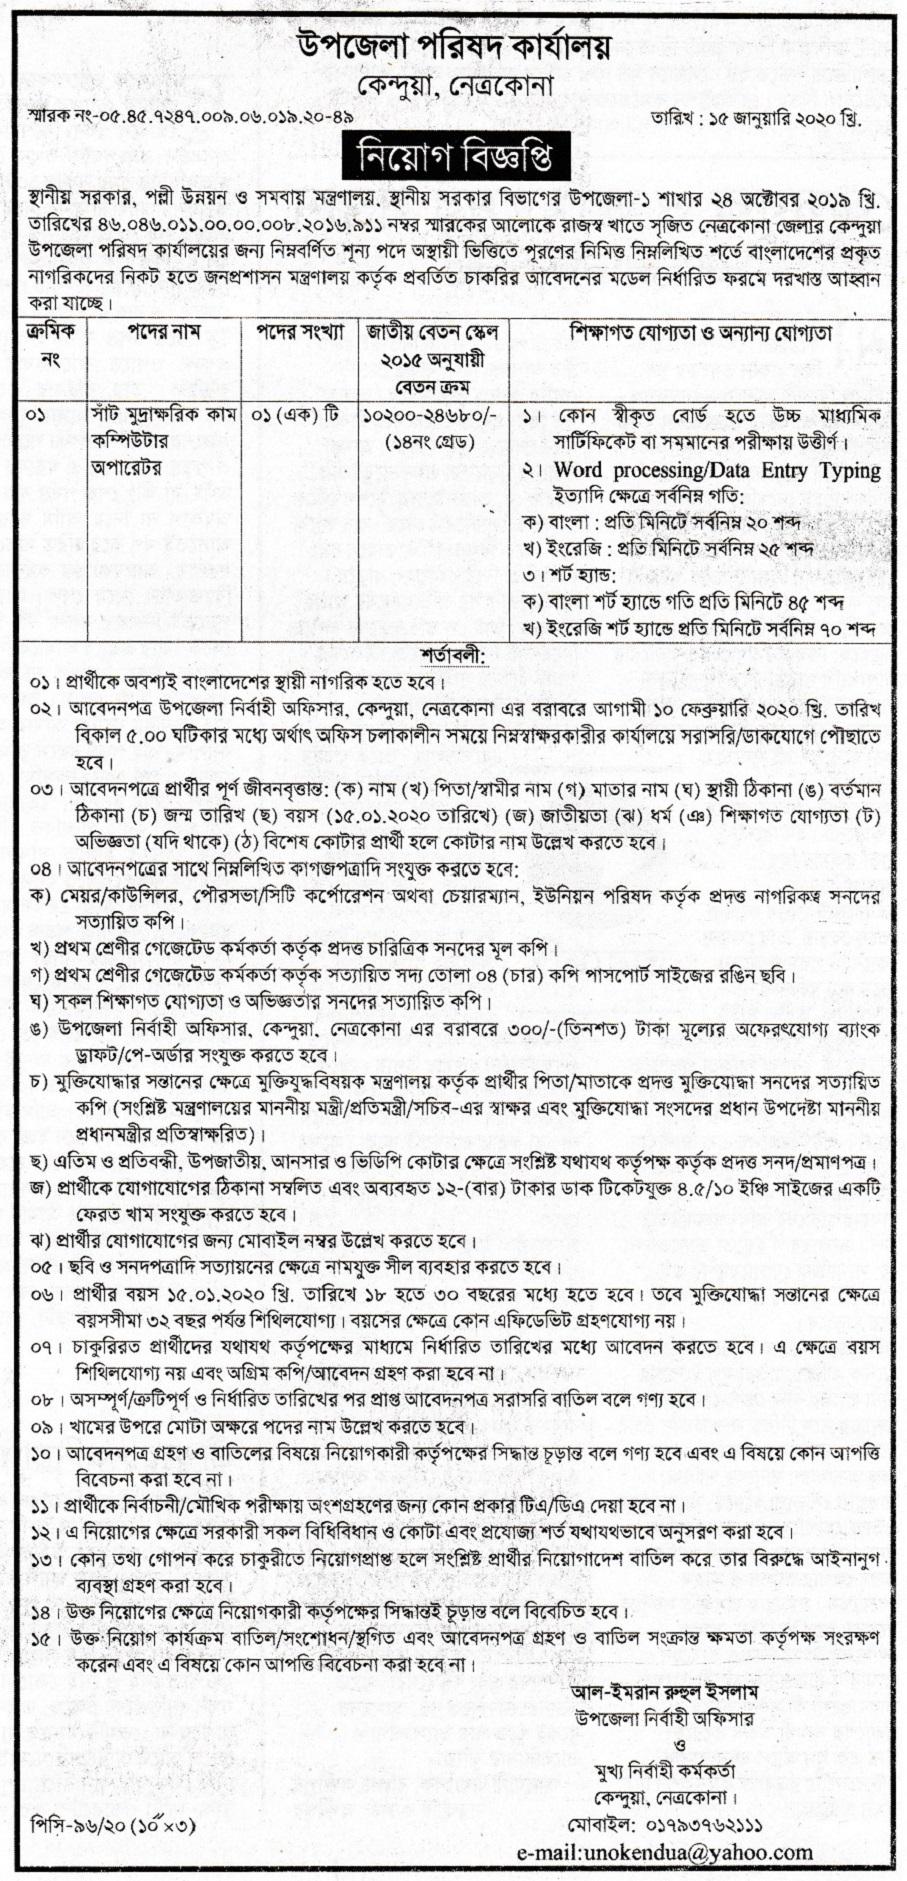 Netrokona Upazila Parishad Office Job Circular 2020